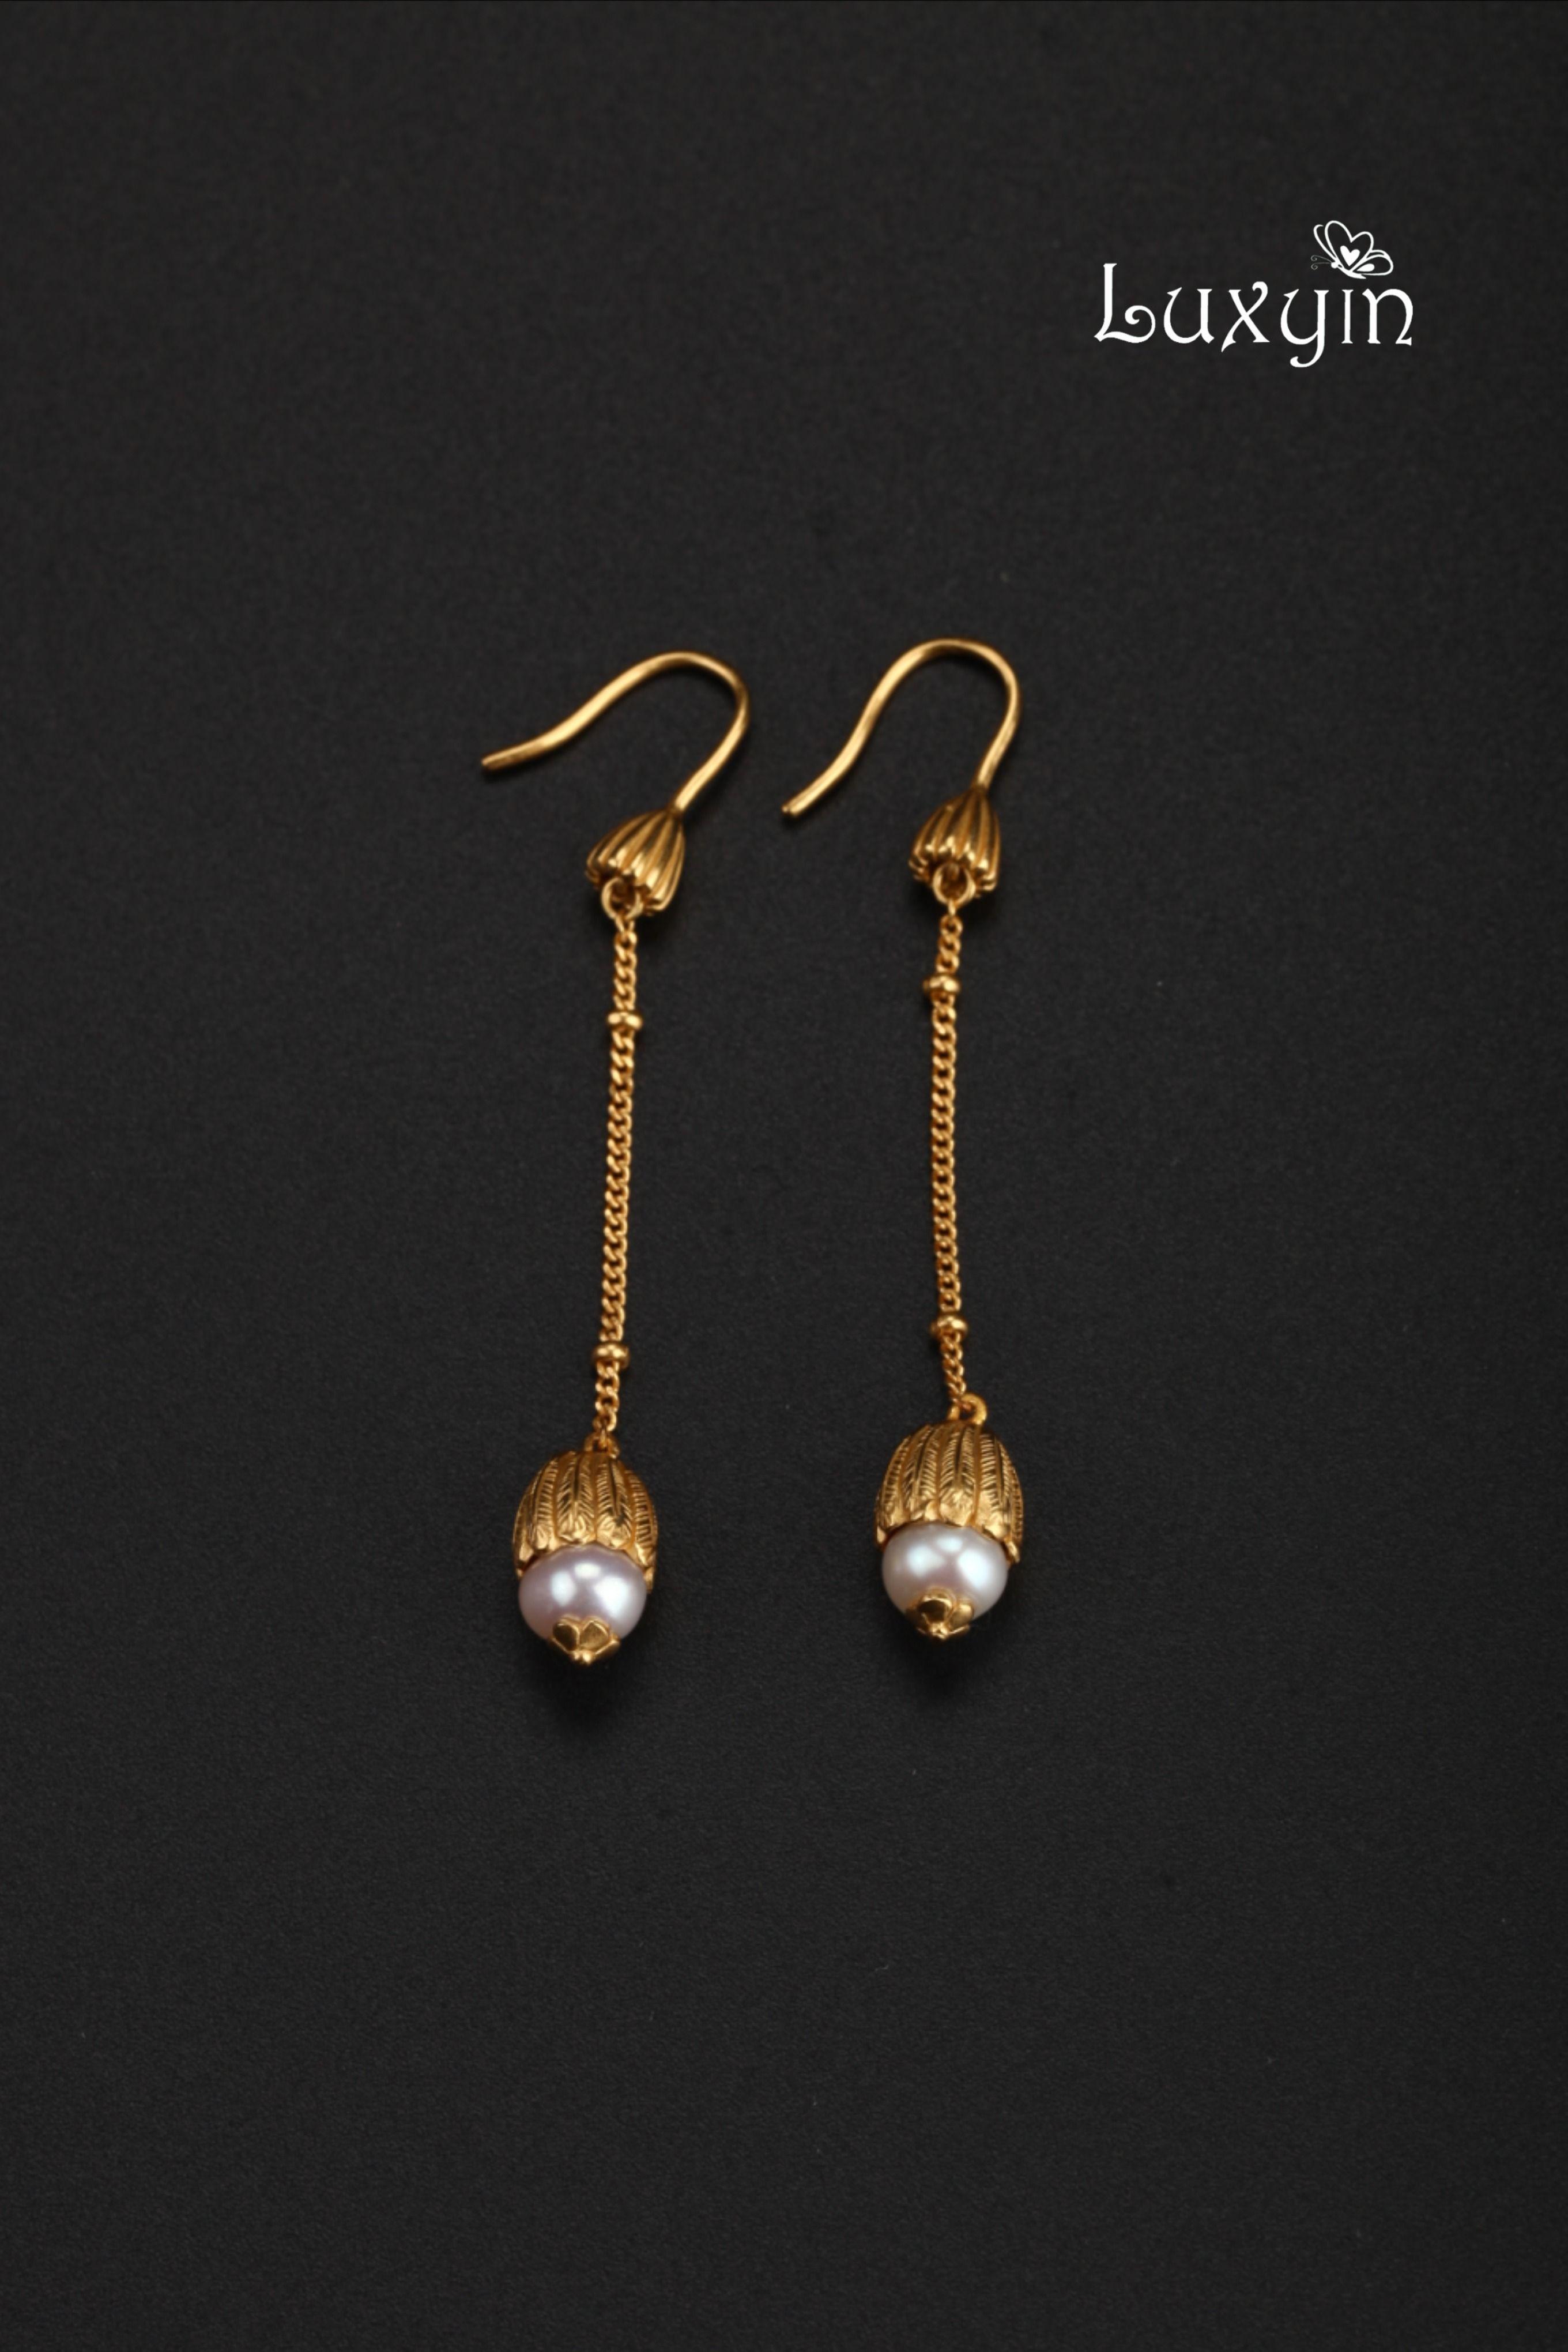 Vintage Style Big Sale In 2020 Vintage Fashion Jewelry Earrings